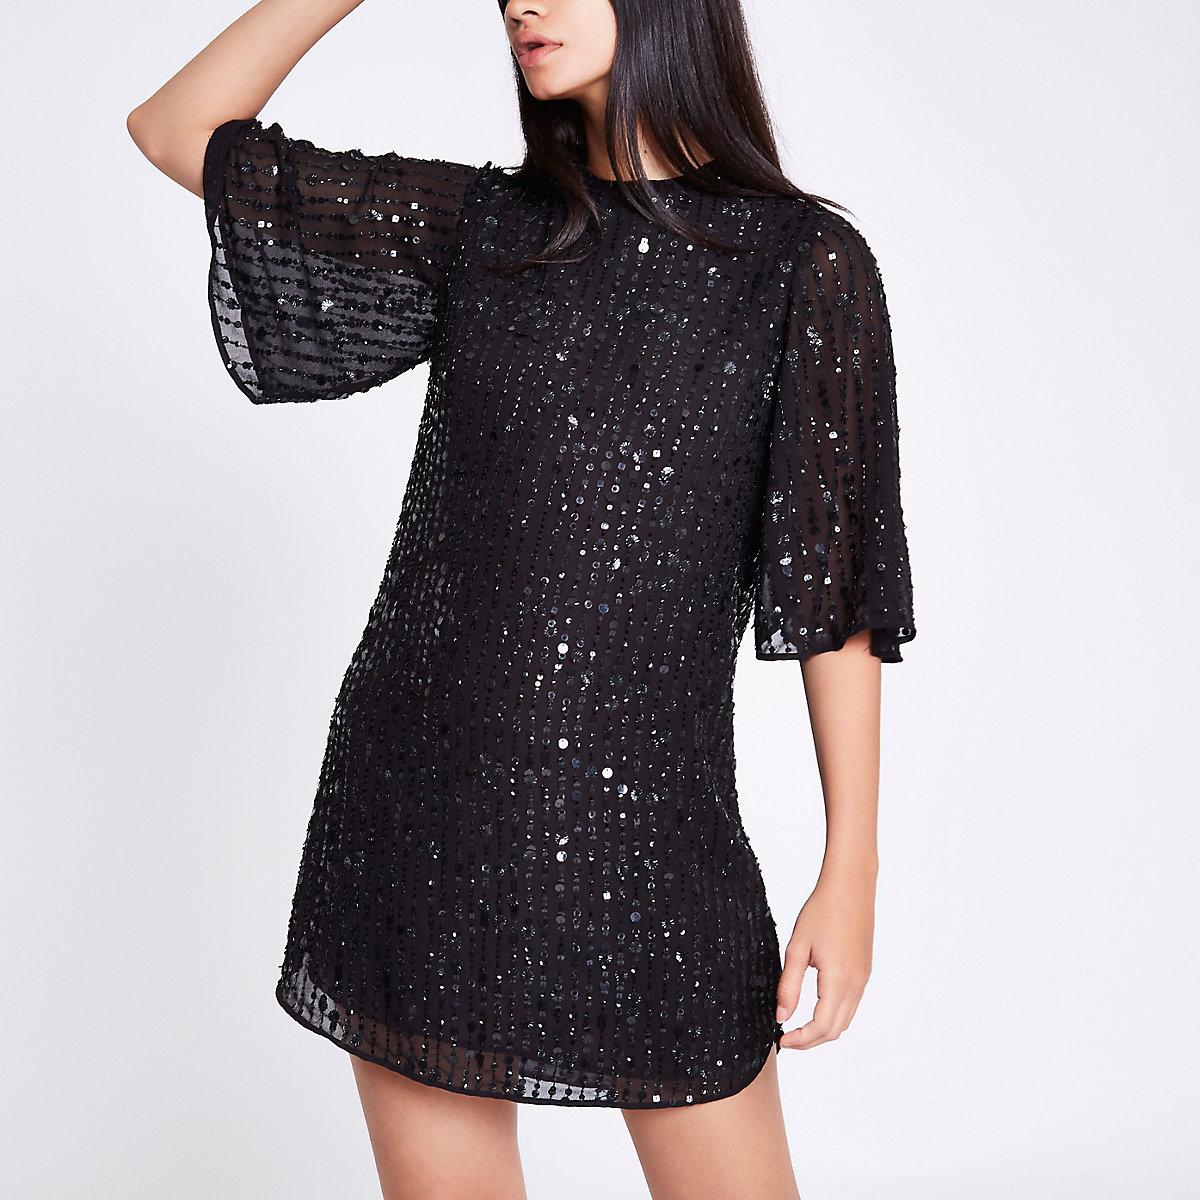 Black sequin swing dress